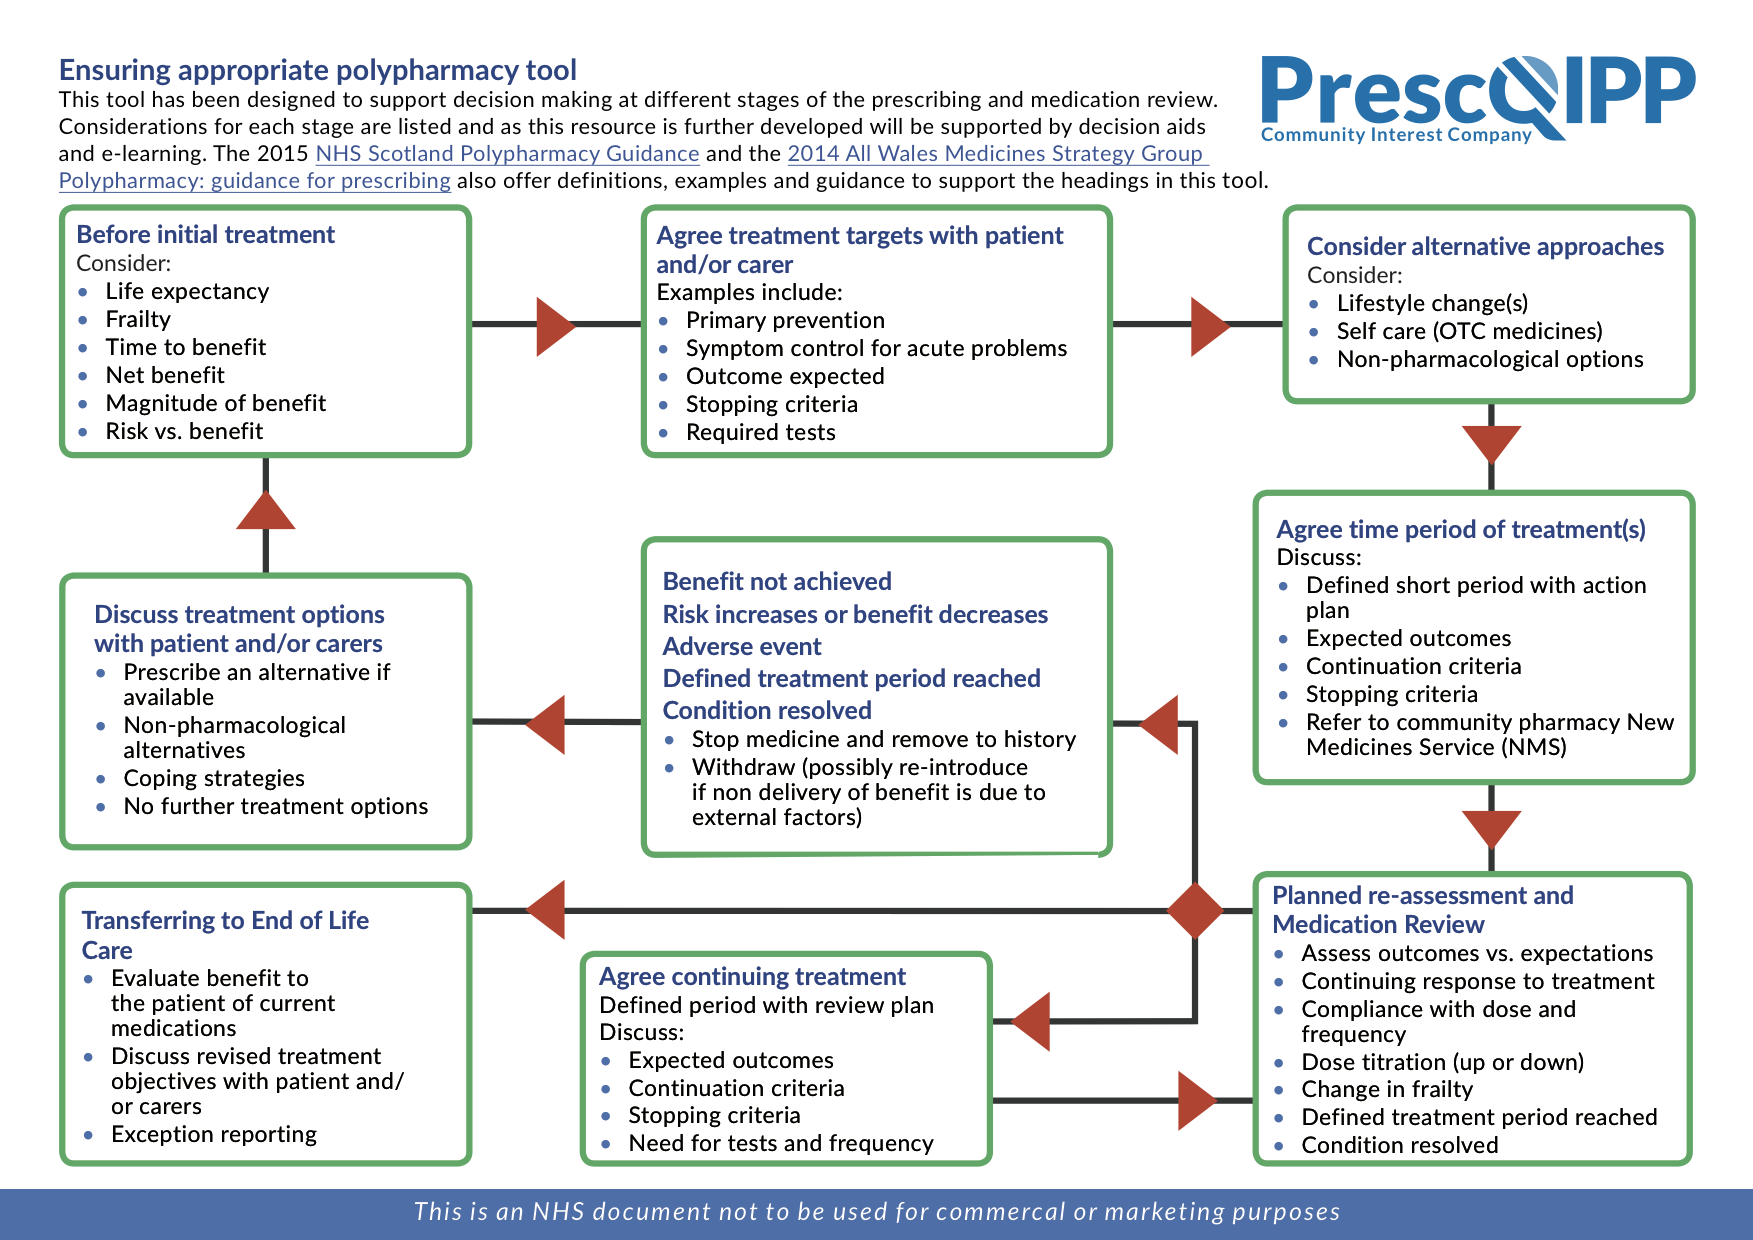 Polypharmacy and deprescribing   PrescQIPP C I C